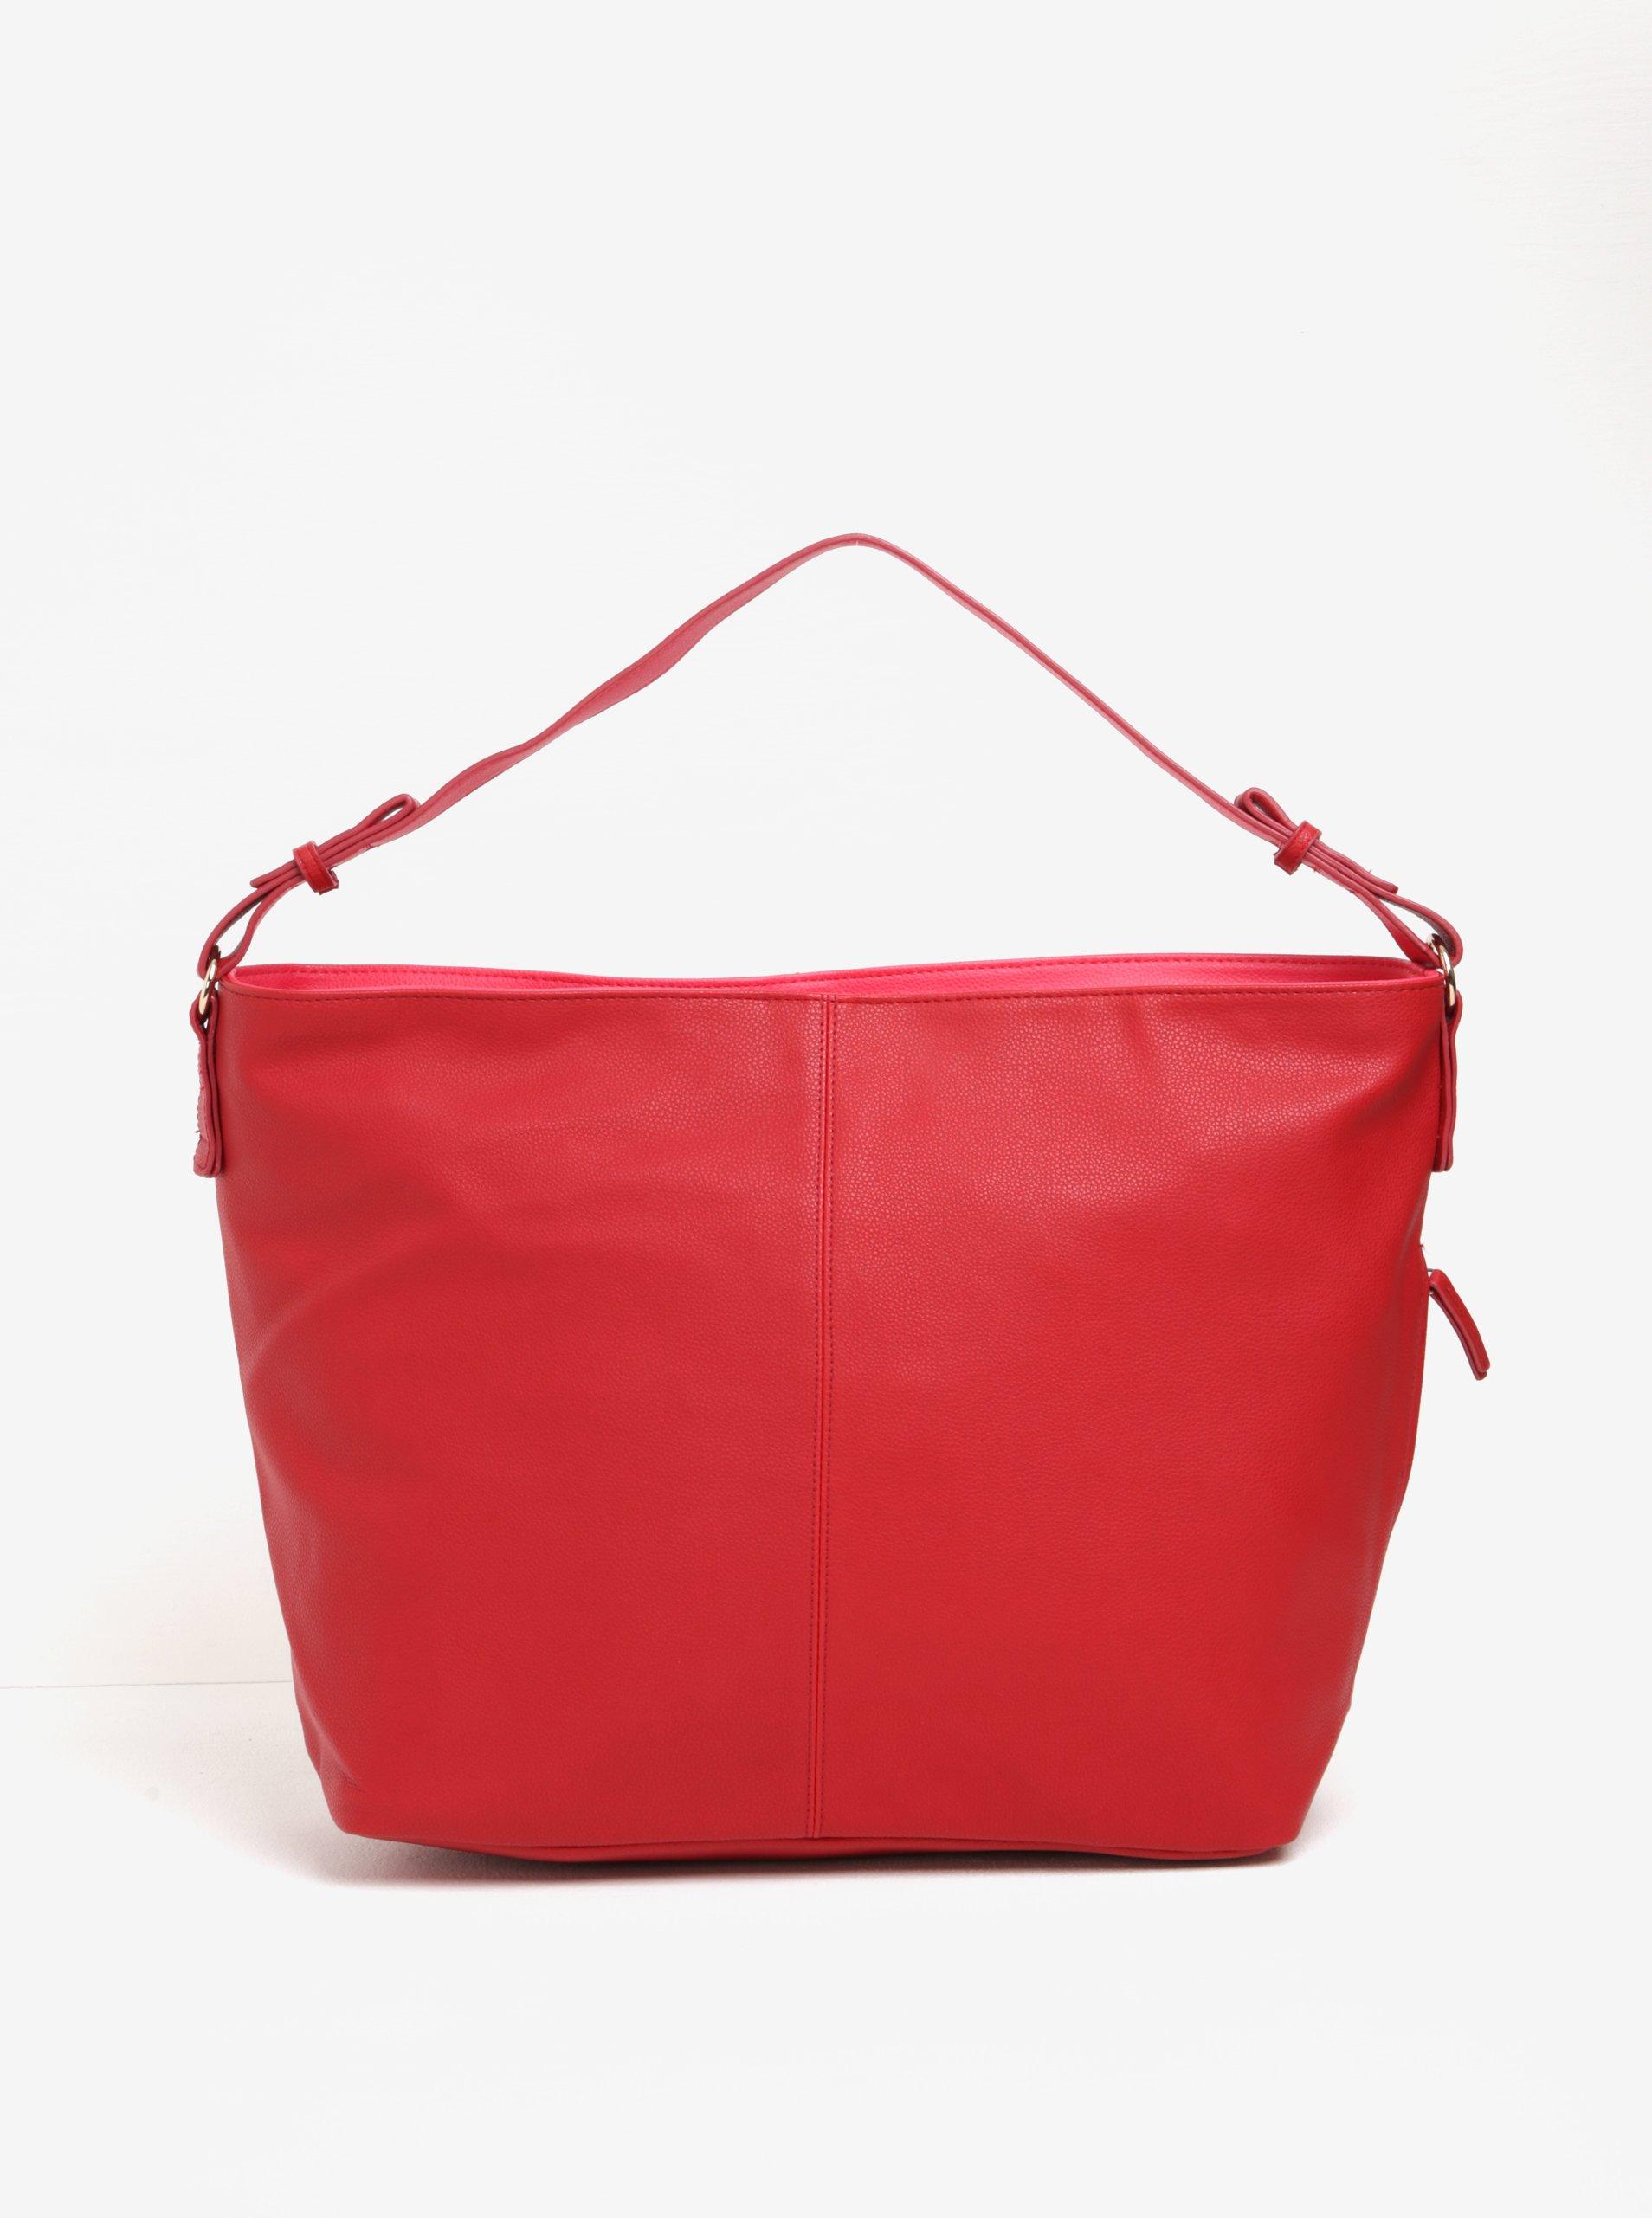 Červená kabelka Paul's Boutique Florence